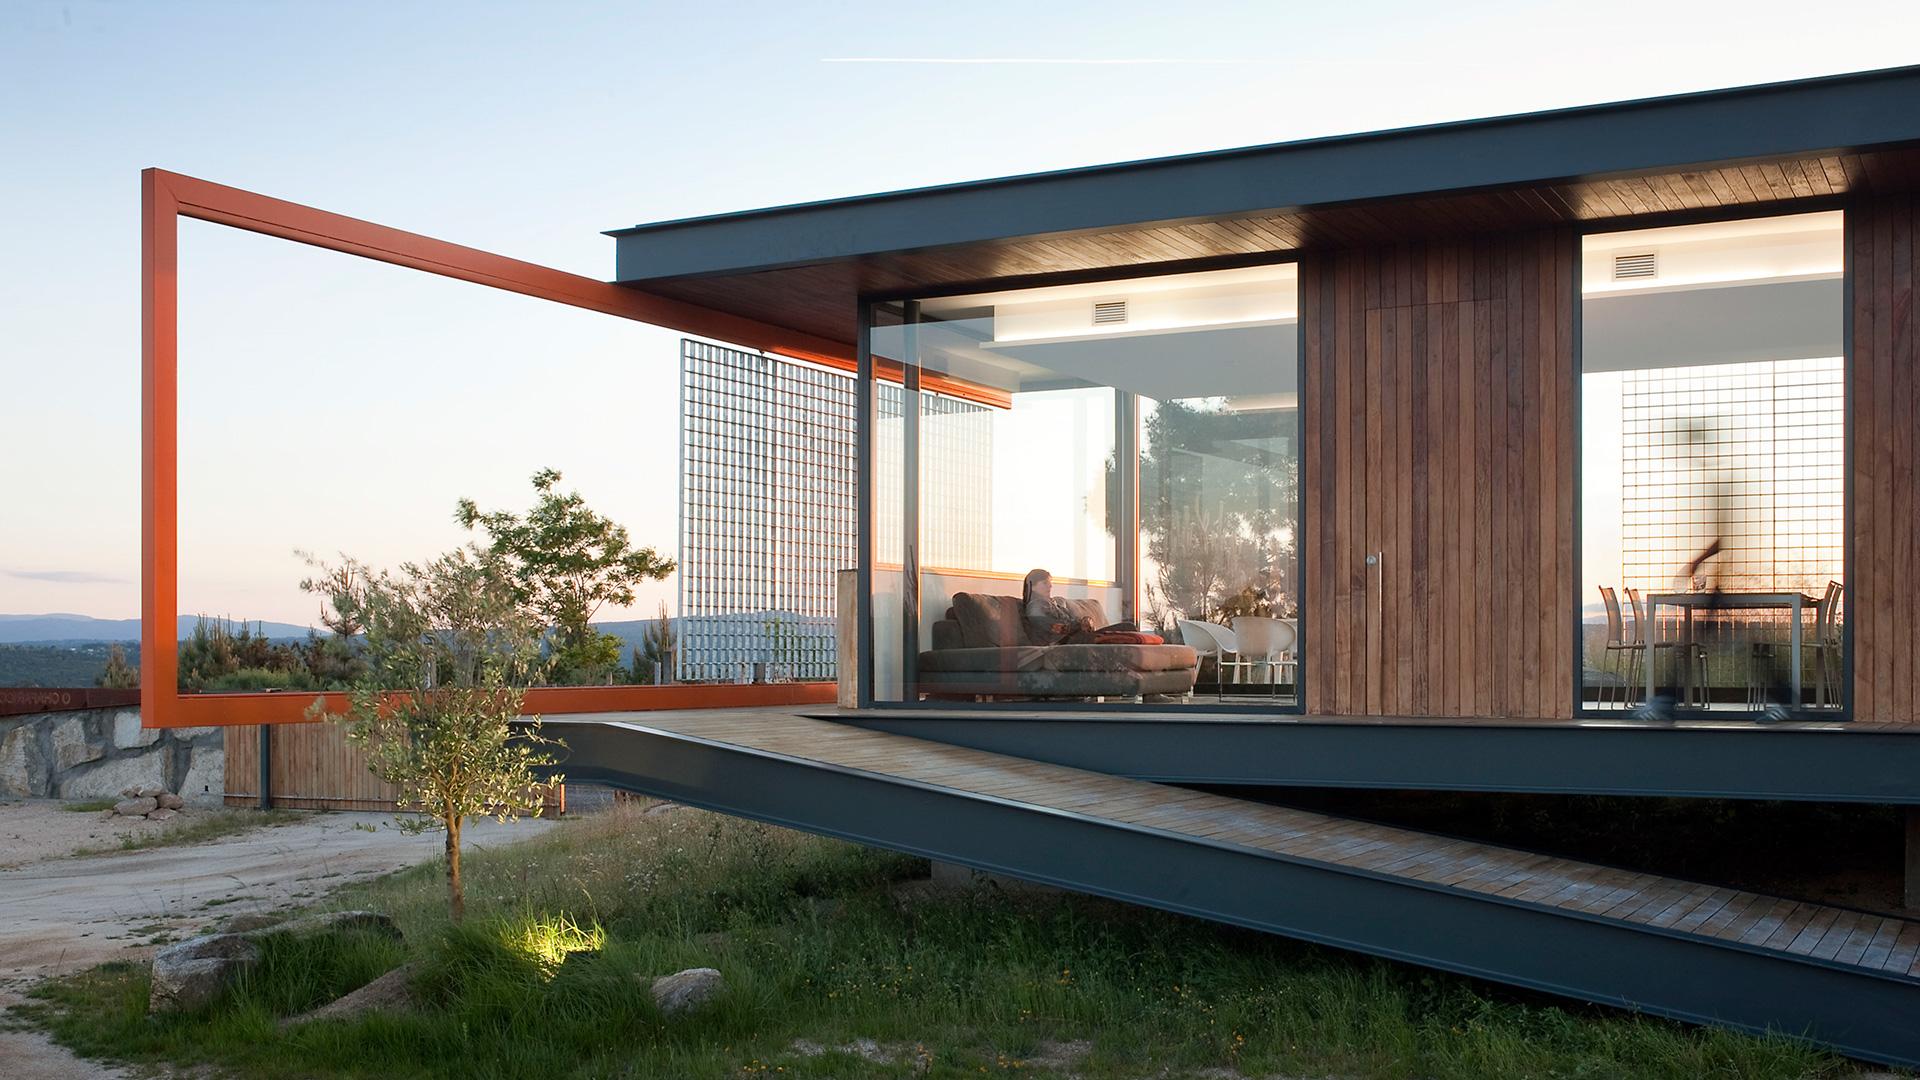 Diseño O Chafarico refugio Ourense Galicia